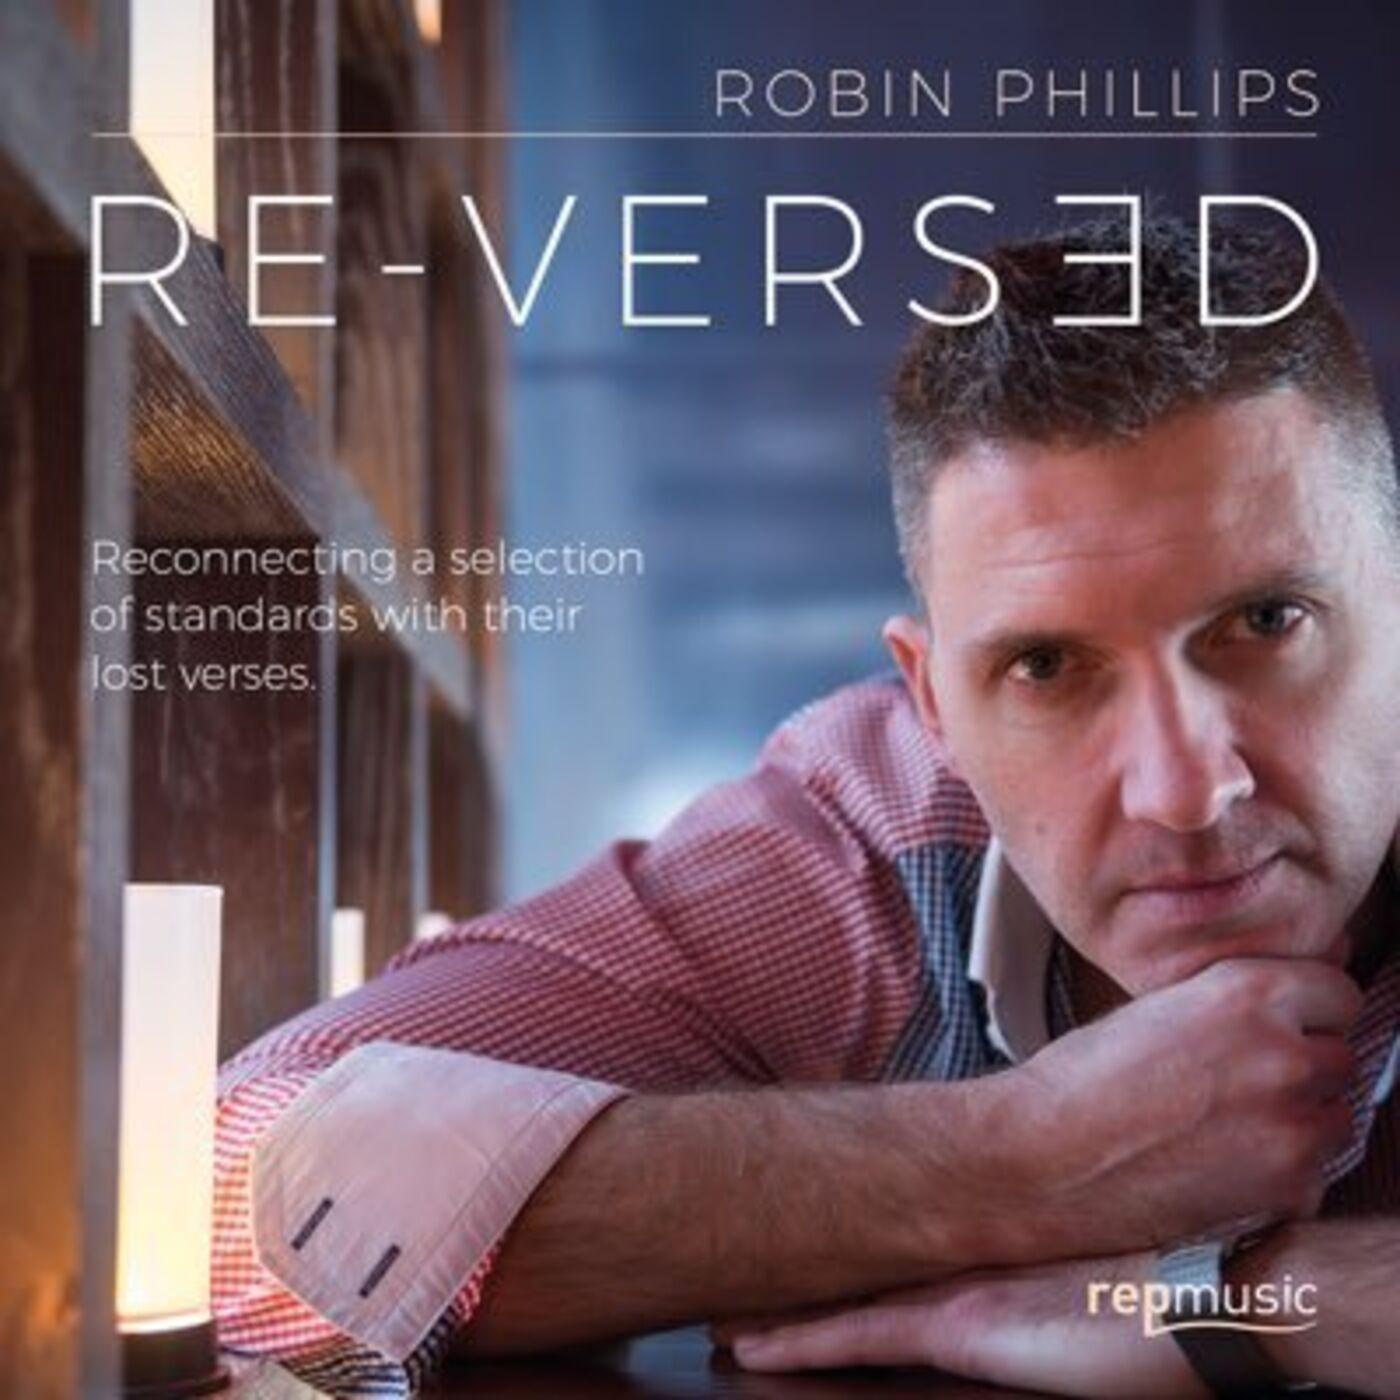 Robin Phillips